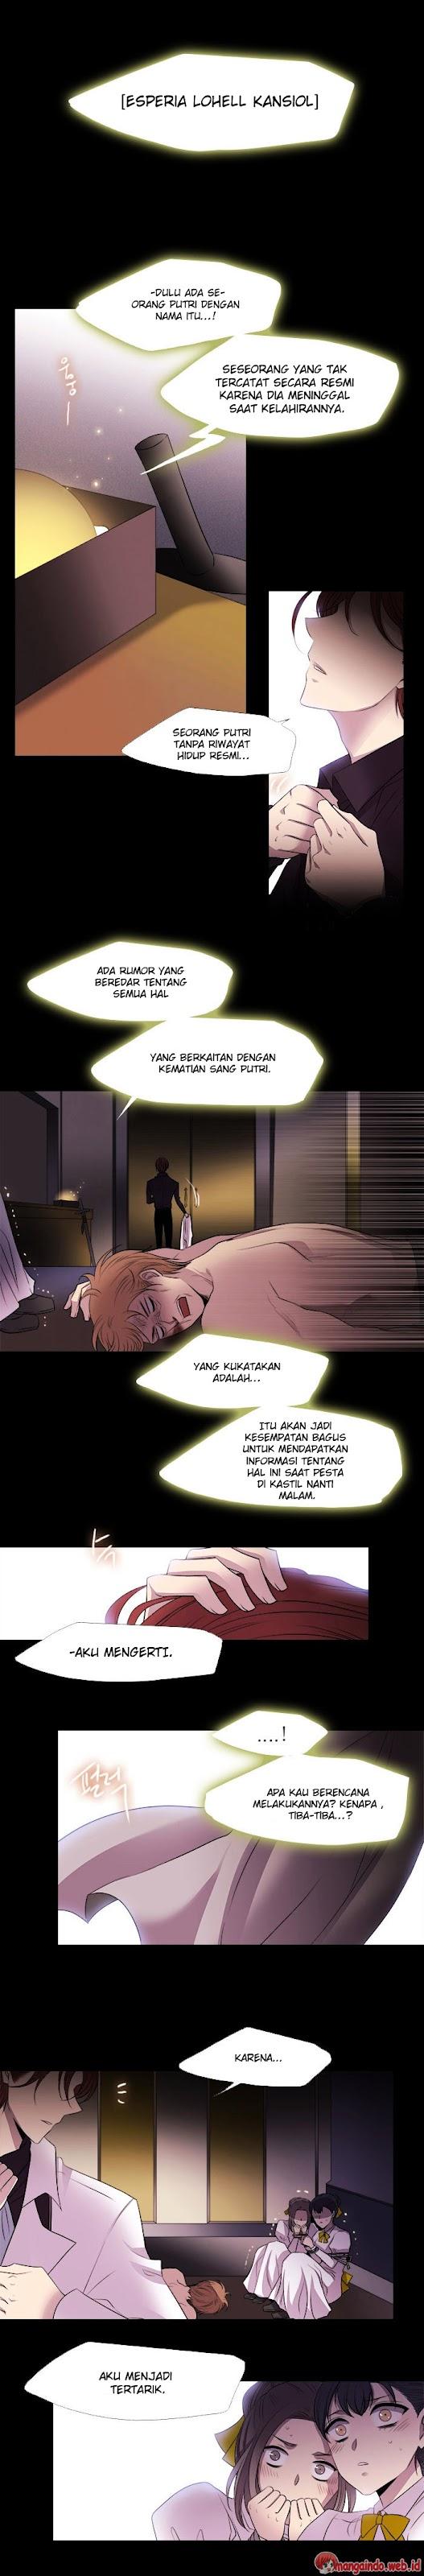 Komik black haze 212 - chapter 212 213 Indonesia black haze 212 - chapter 212 Terbaru 10|Baca Manga Komik Indonesia